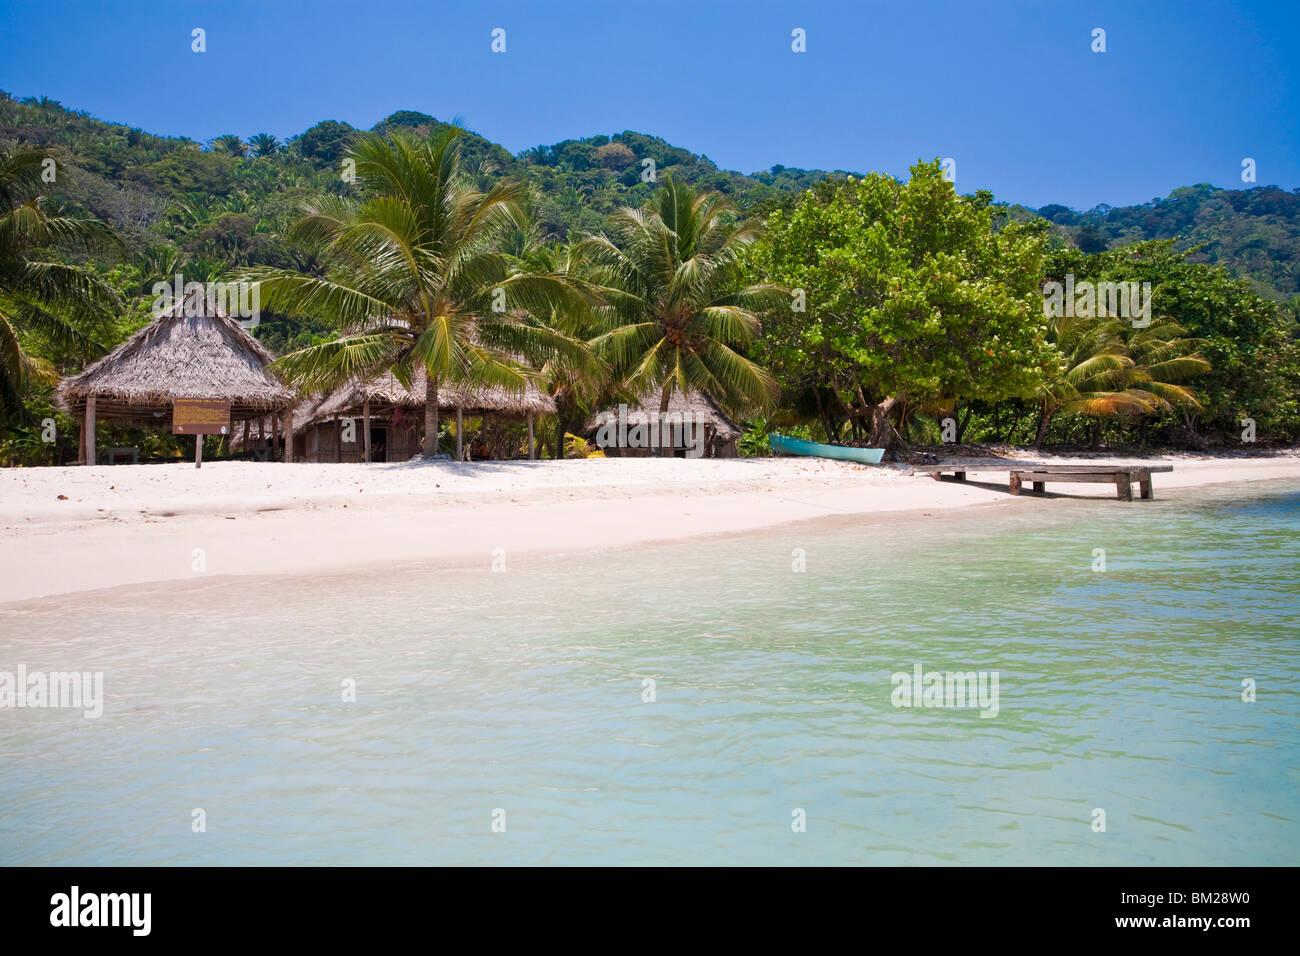 Cocalto Playa, Parque Nacional Jeannette Kawas, Punta Sal, Tela, Honduras Imagen De Stock